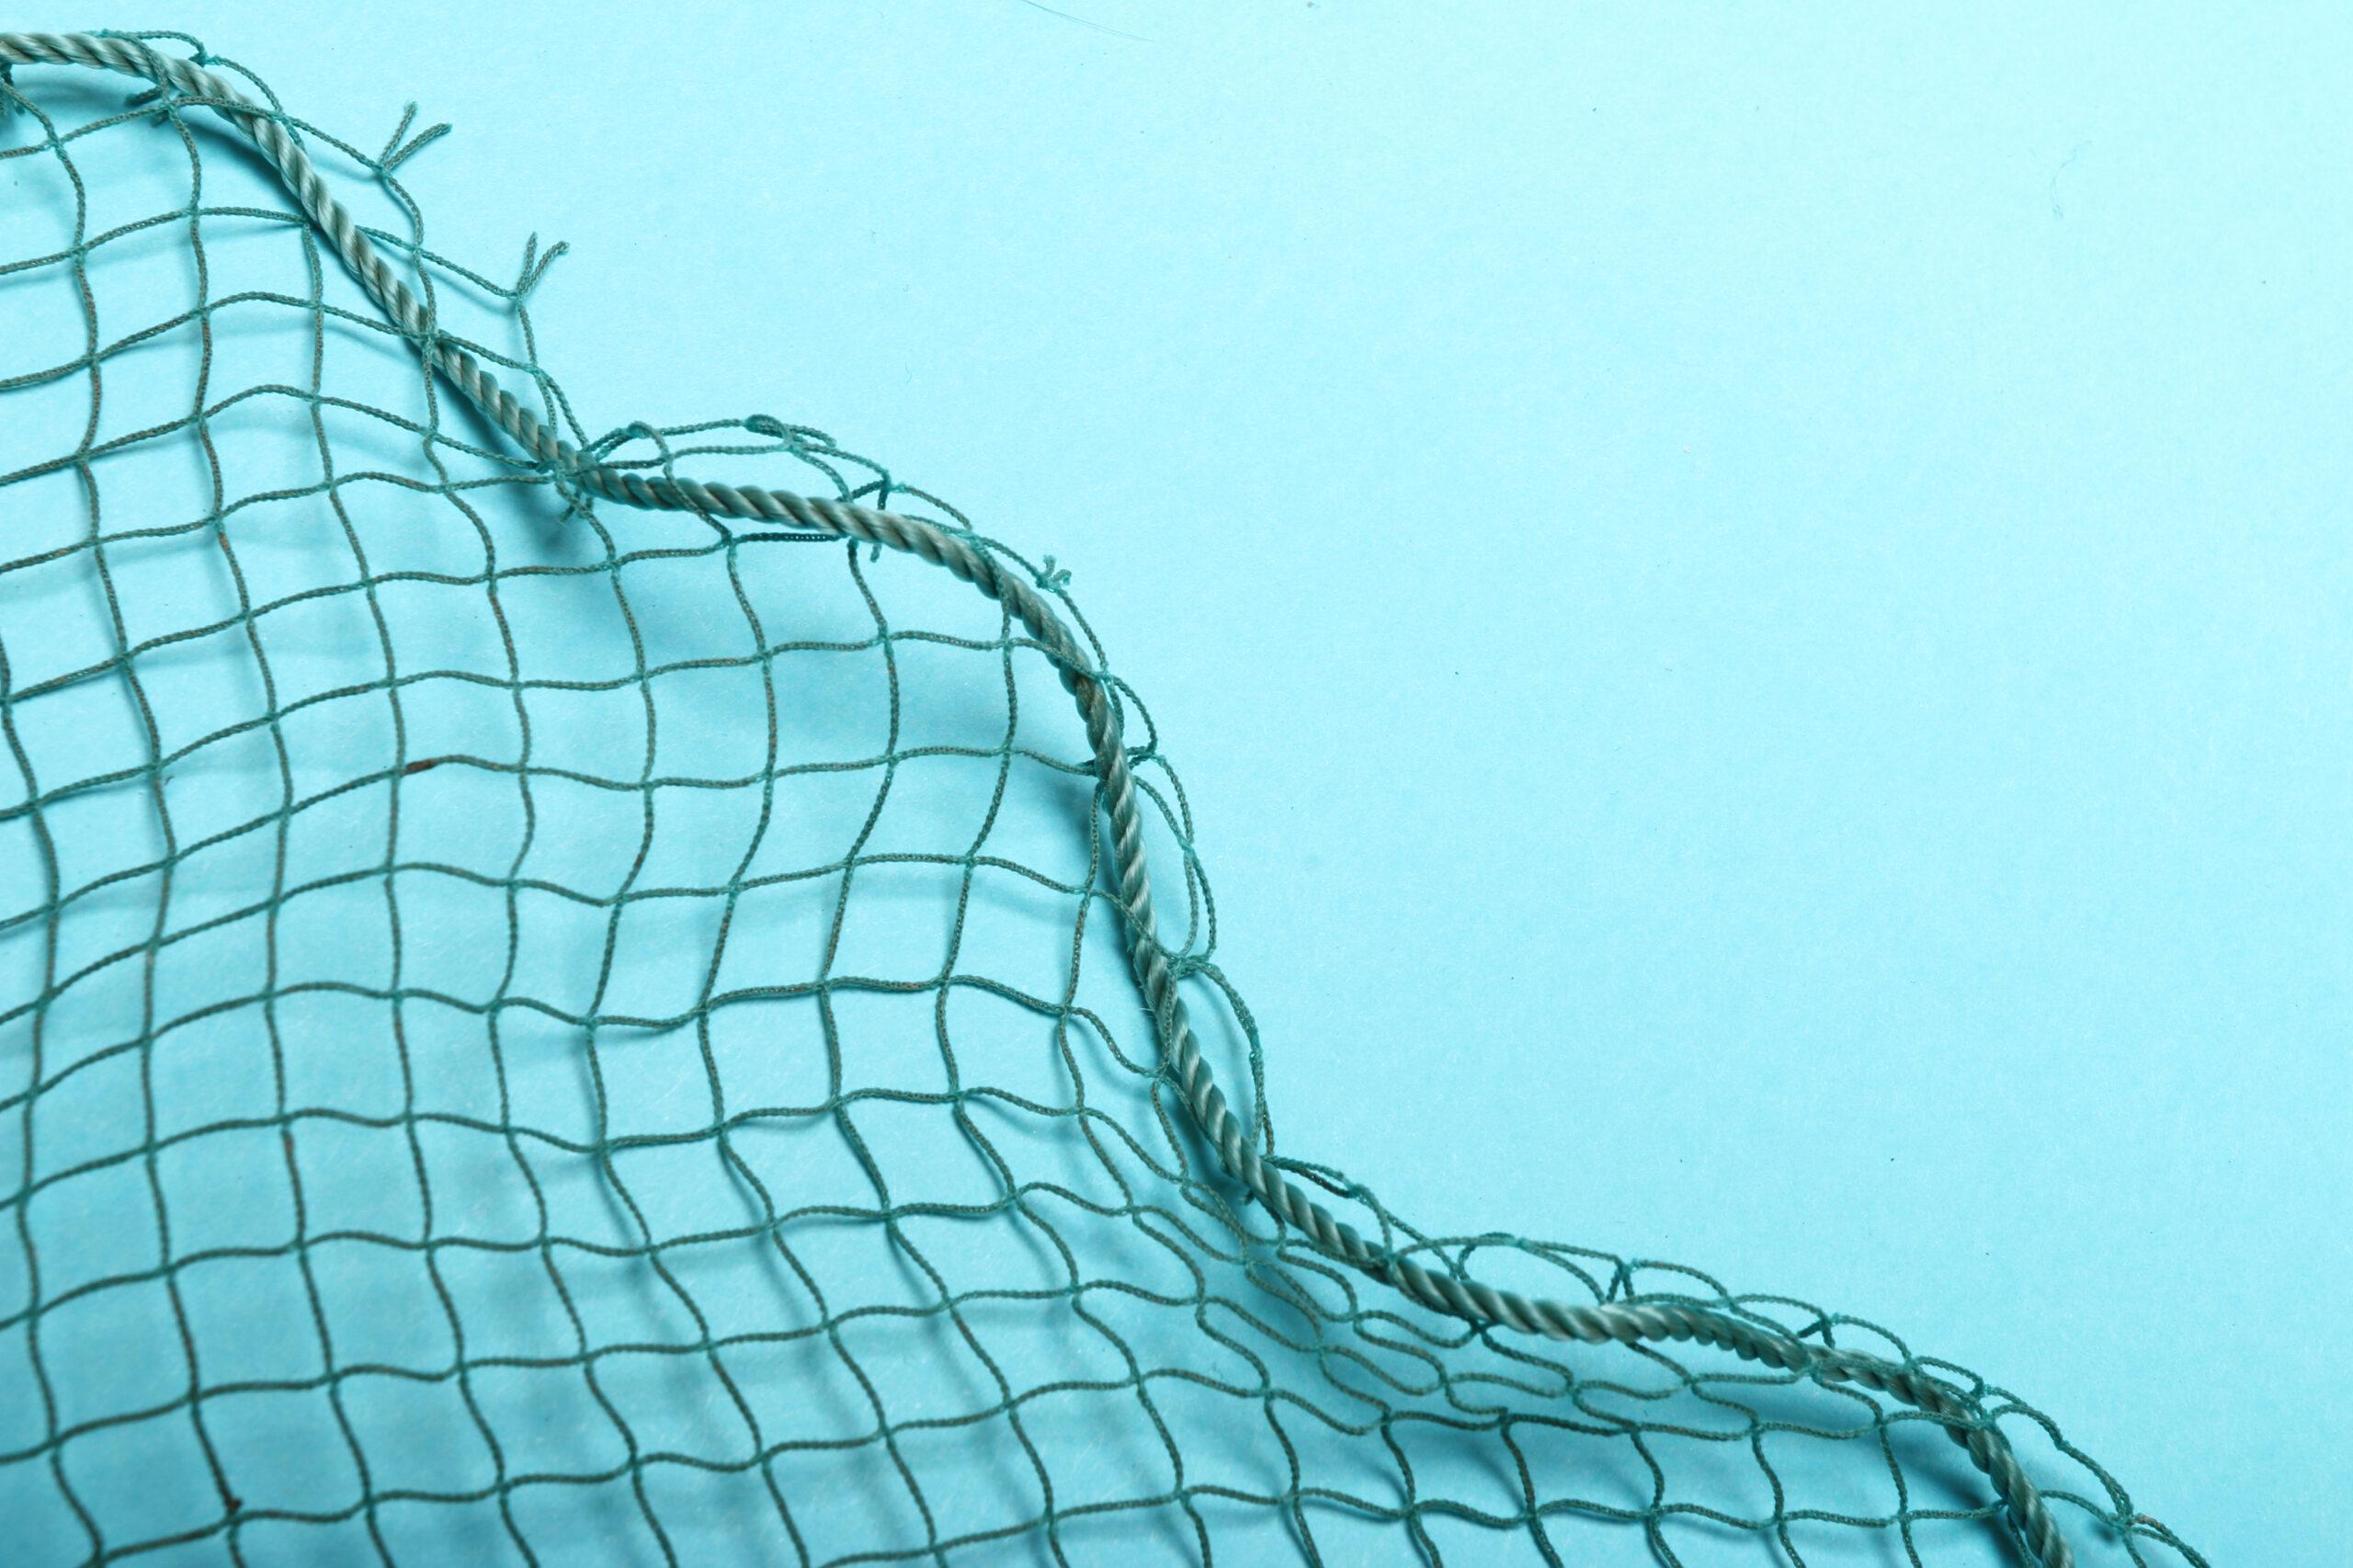 fishing_netting